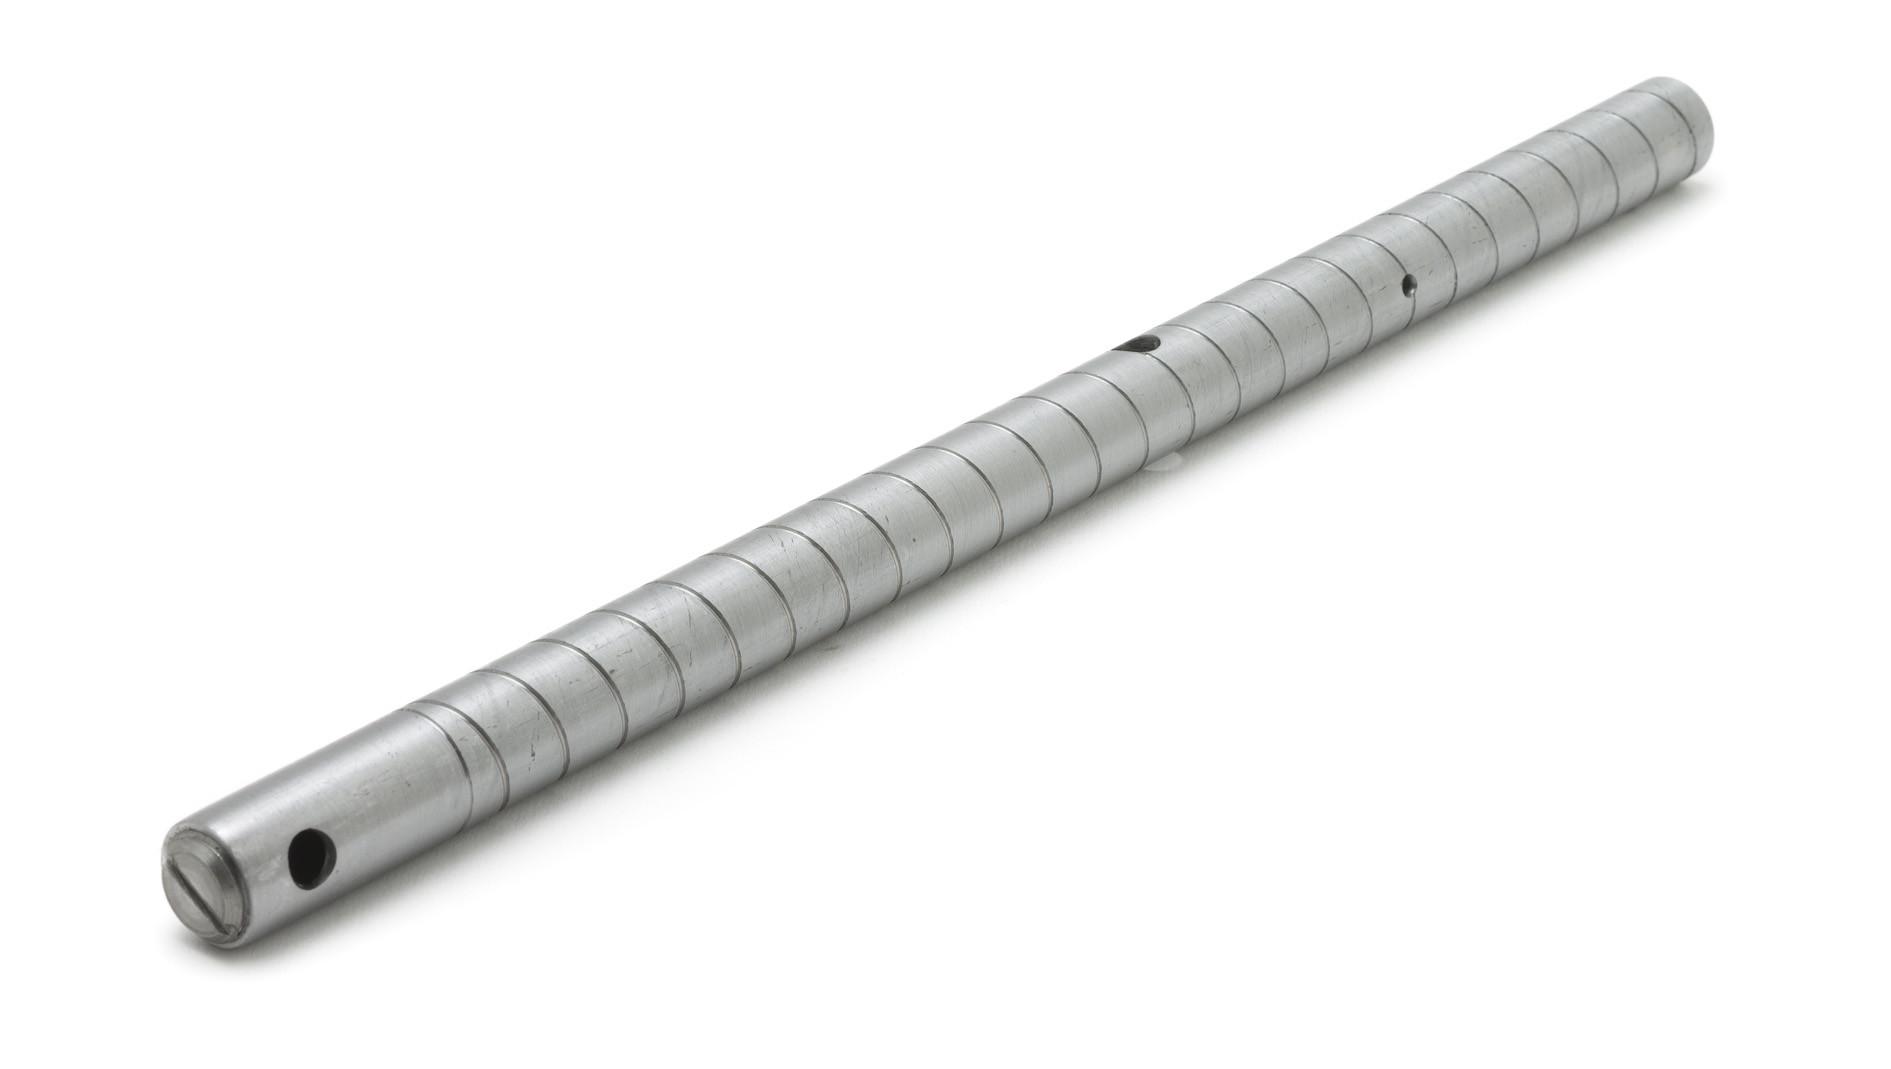 Pedal shaft